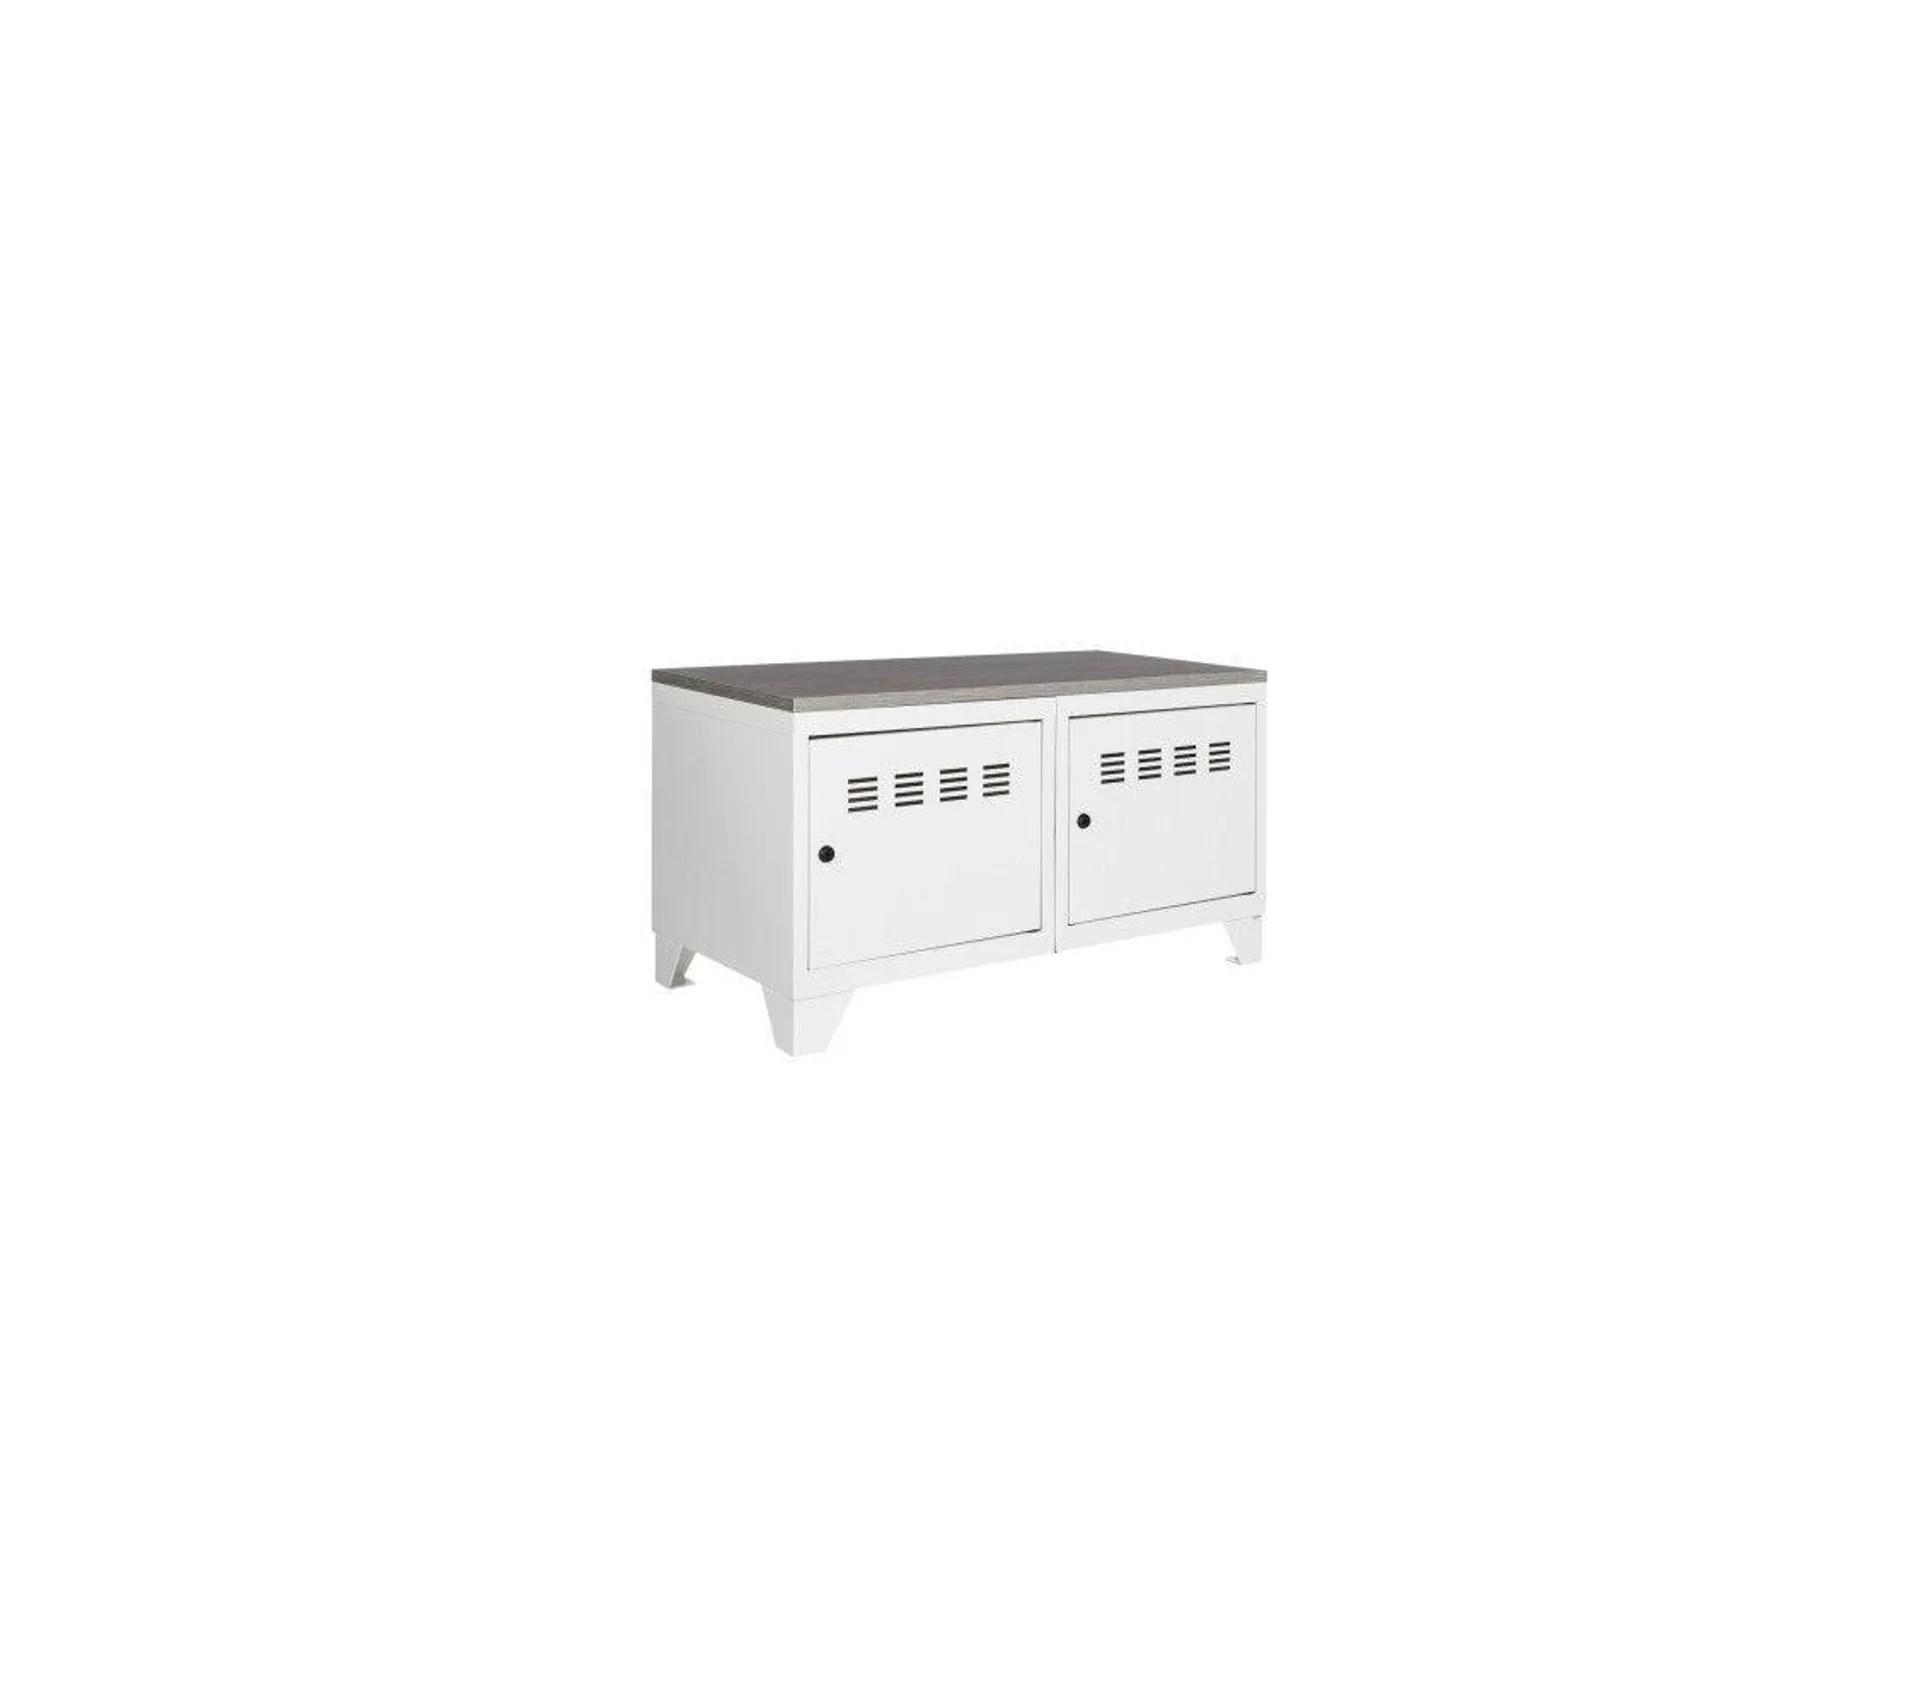 meuble bas industriel metal blanc